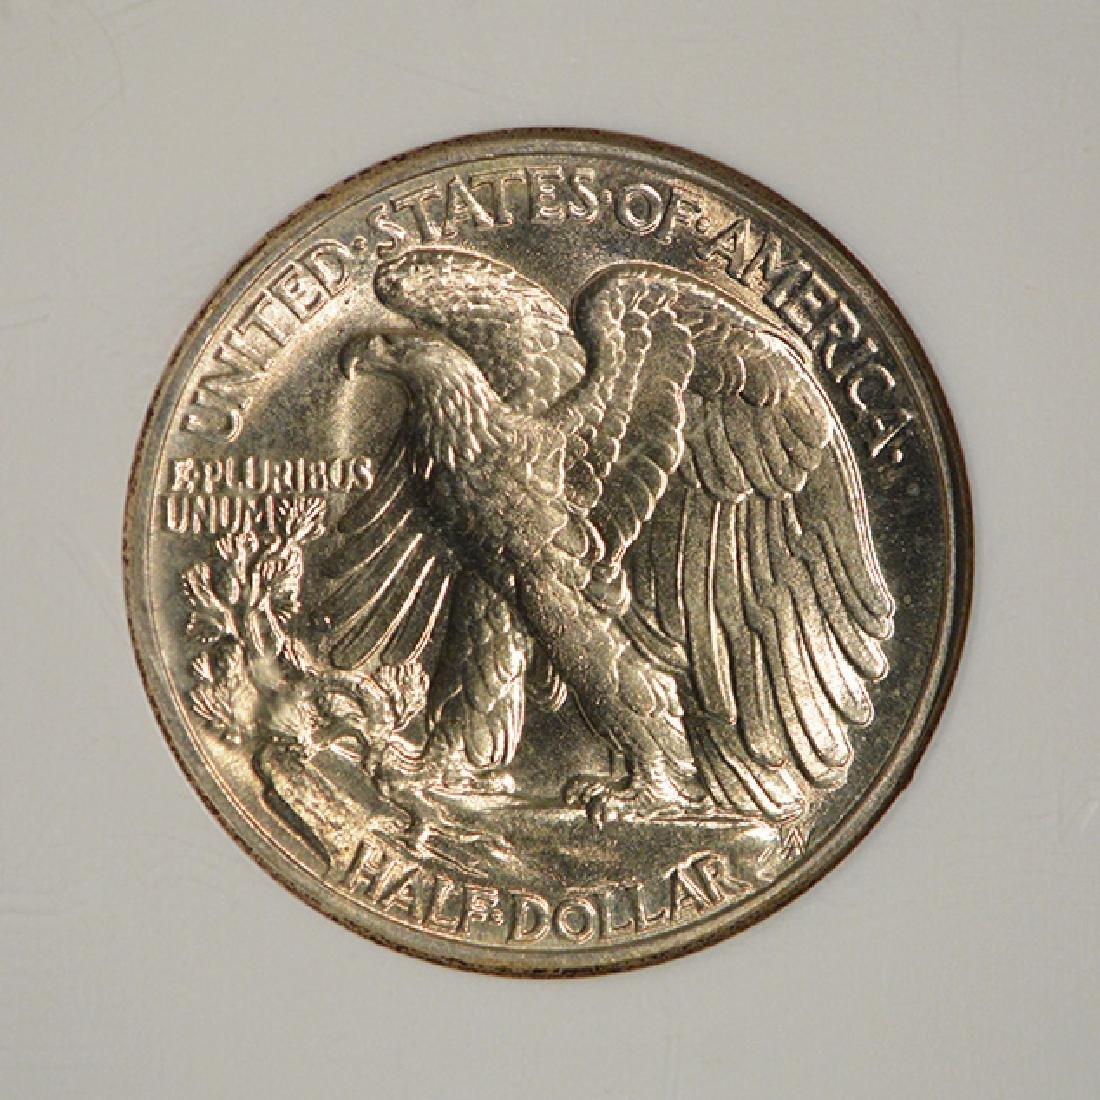 1941 Walking Liberty Half Dollar Coin NGC MS65 - 4